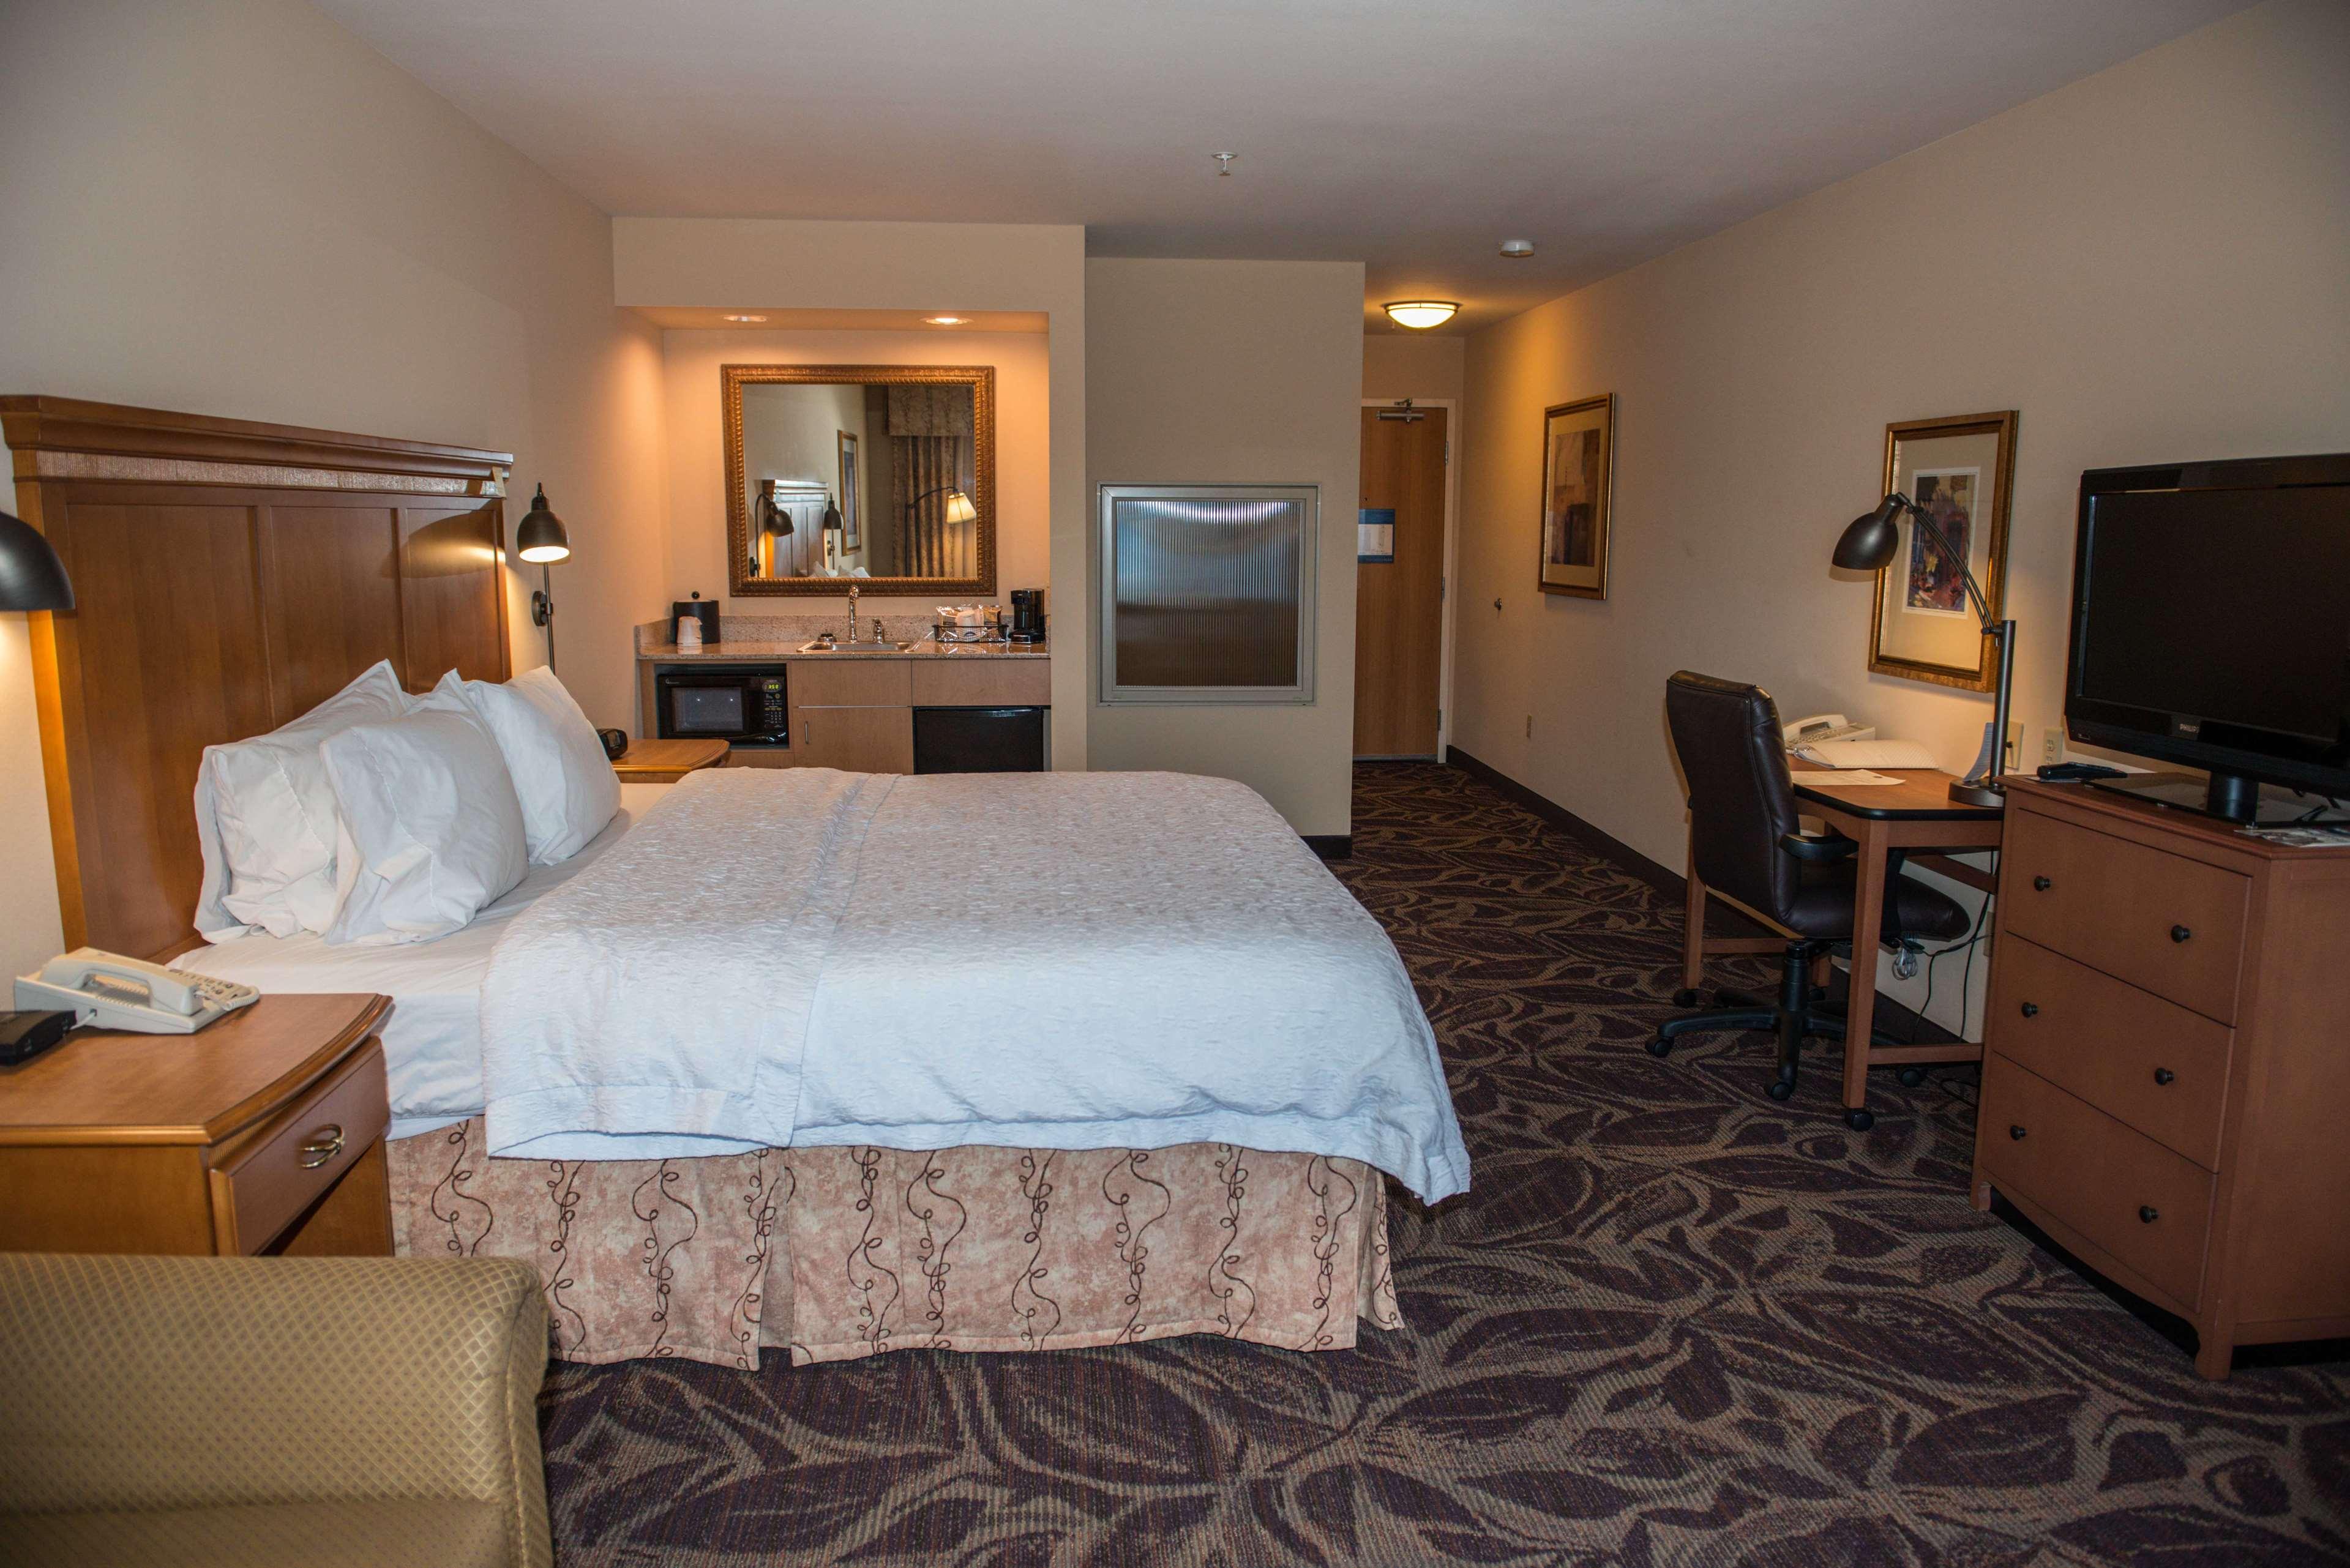 Hampton Inn & Suites Bremerton image 47